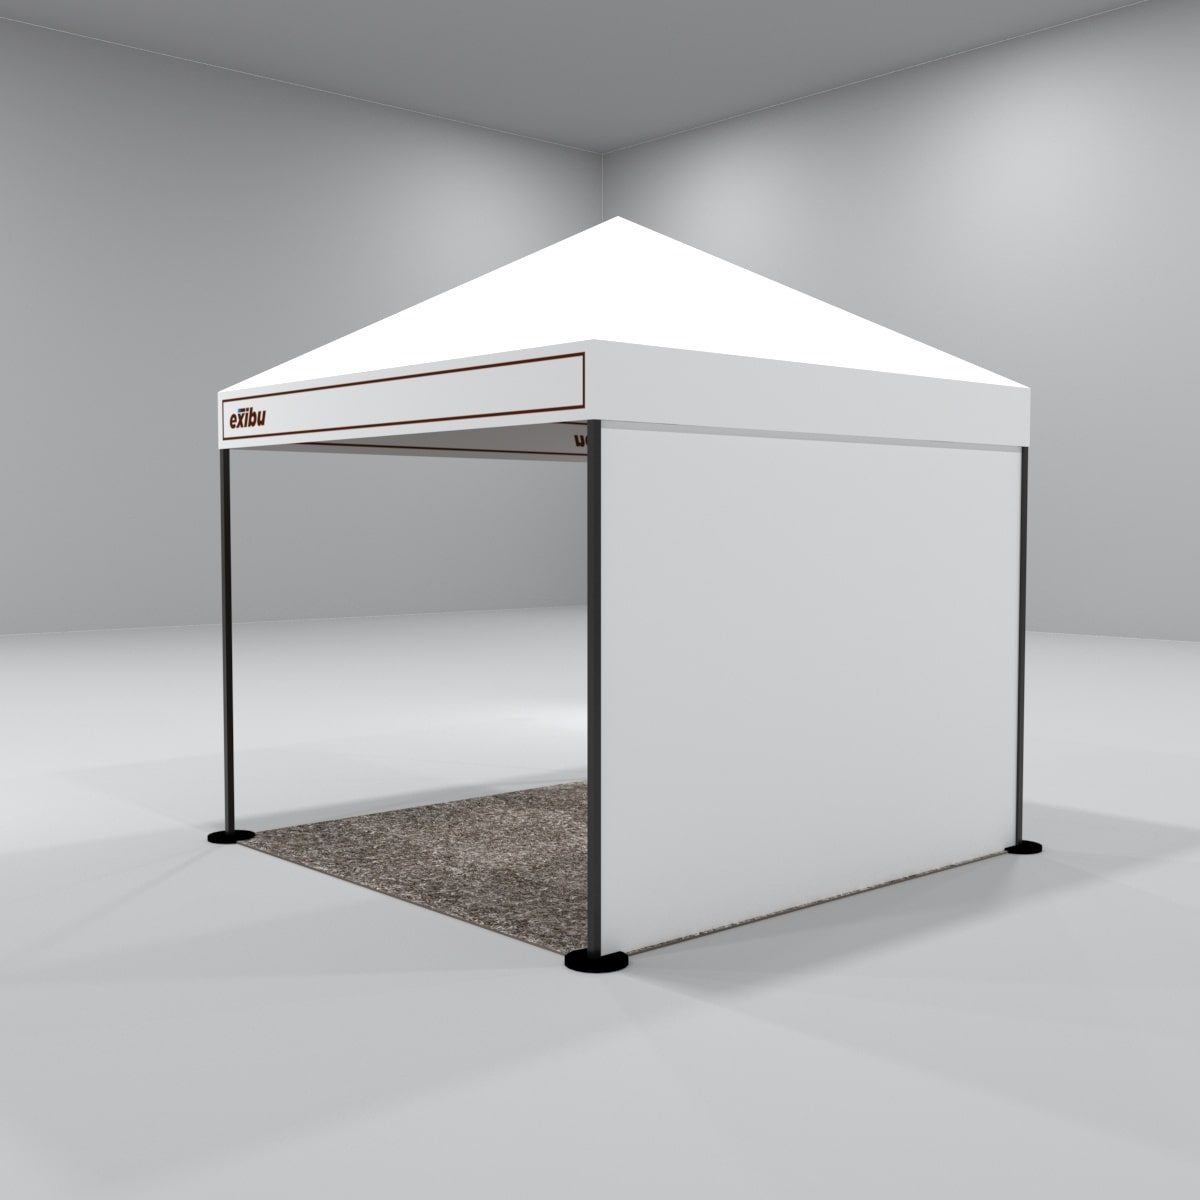 Kit 3 – 3X3 M Gazebo Tent With Backdrop And Facia Print